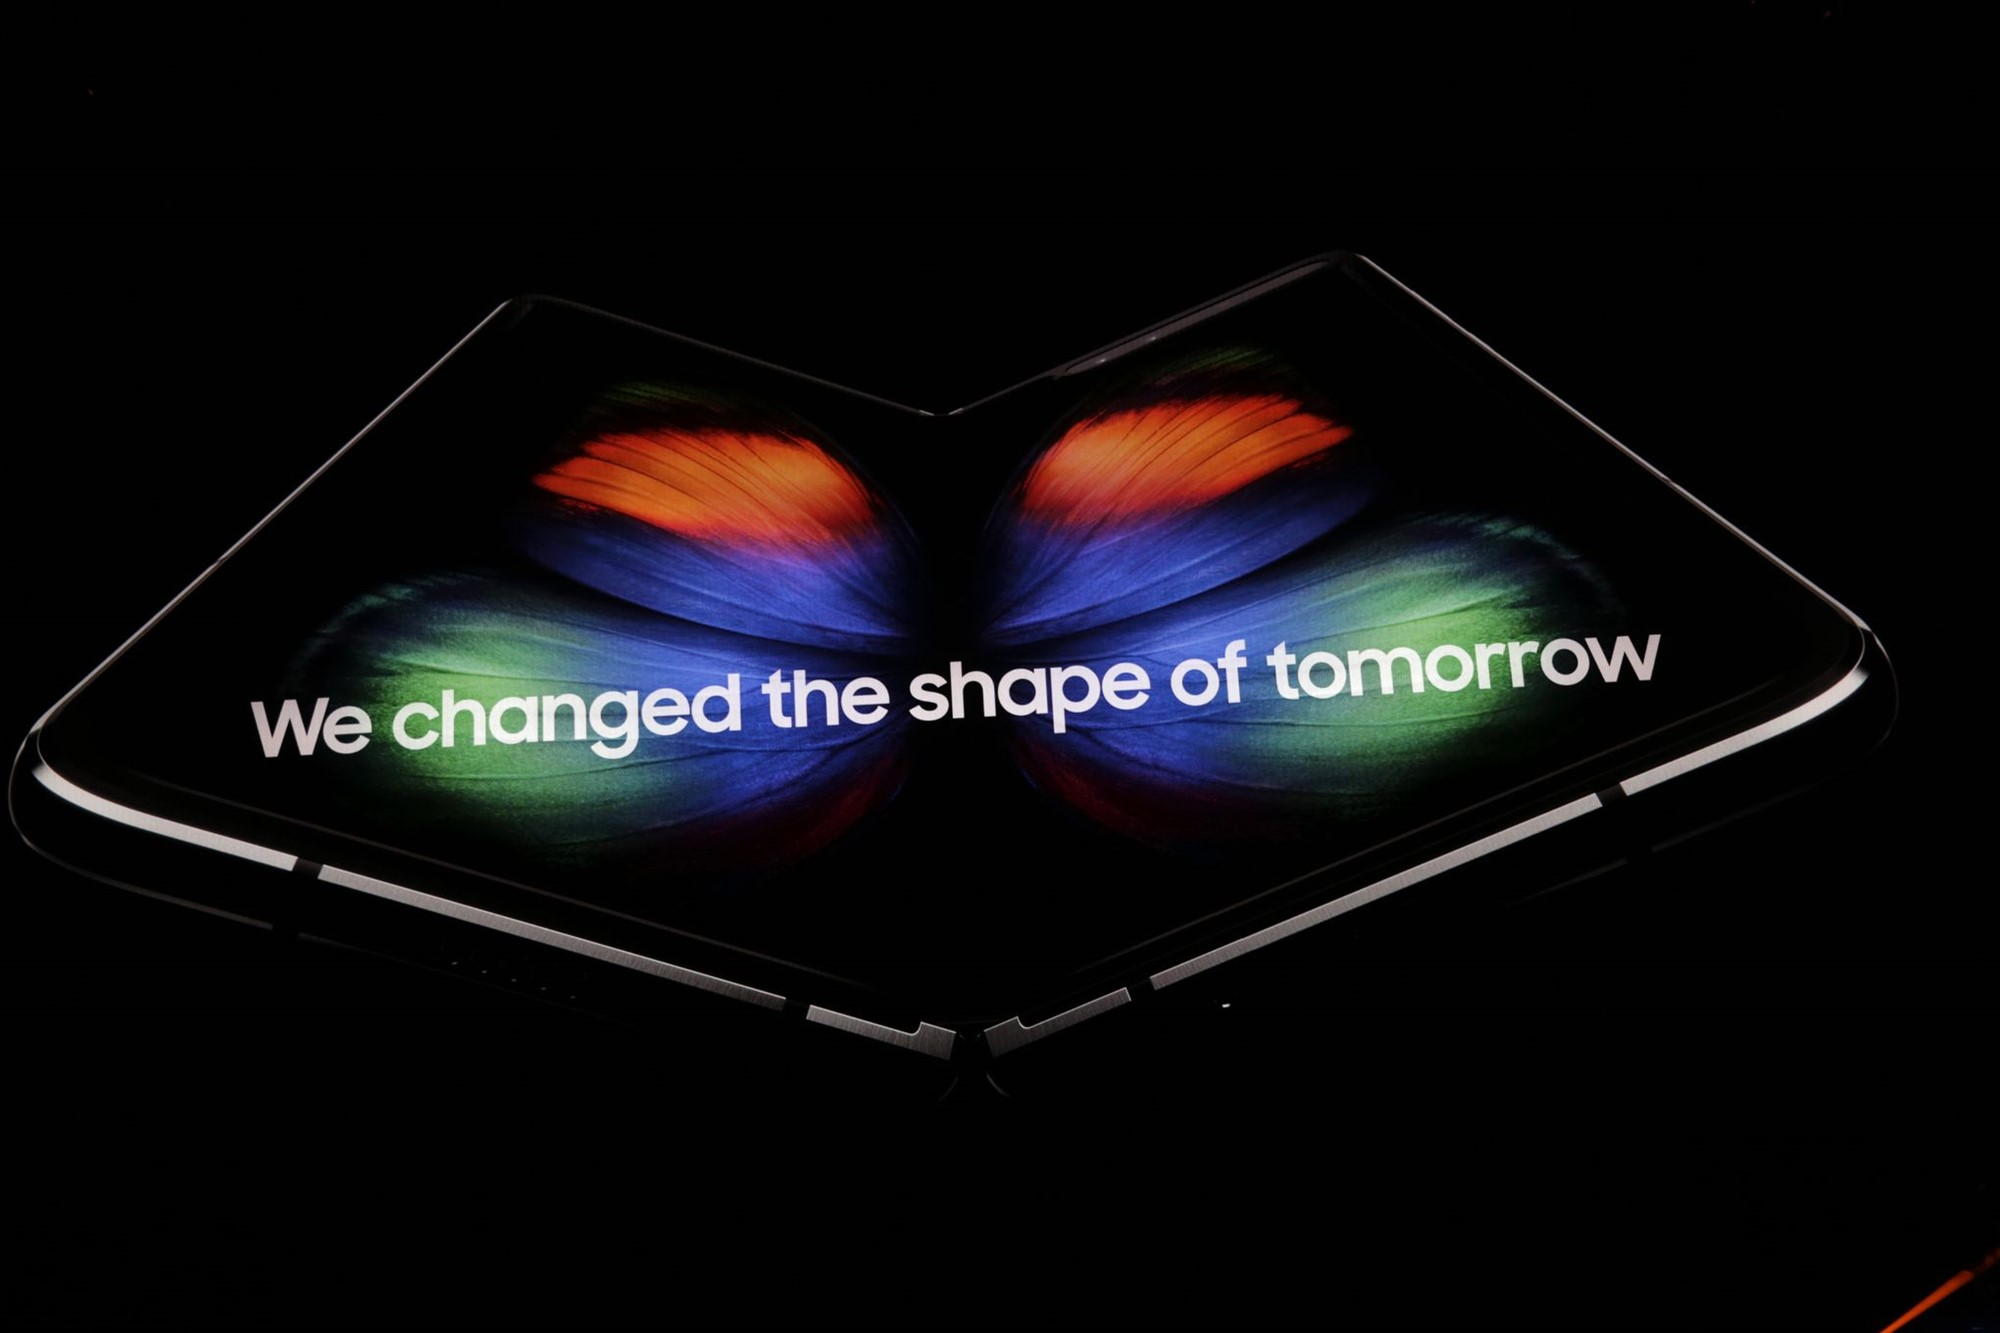 lcimg e7971ab8 21f0 4d30 a9f8 6682f917f642 - Samsung unveils the Galaxy Fold - a foldable smartphone that costs $1980